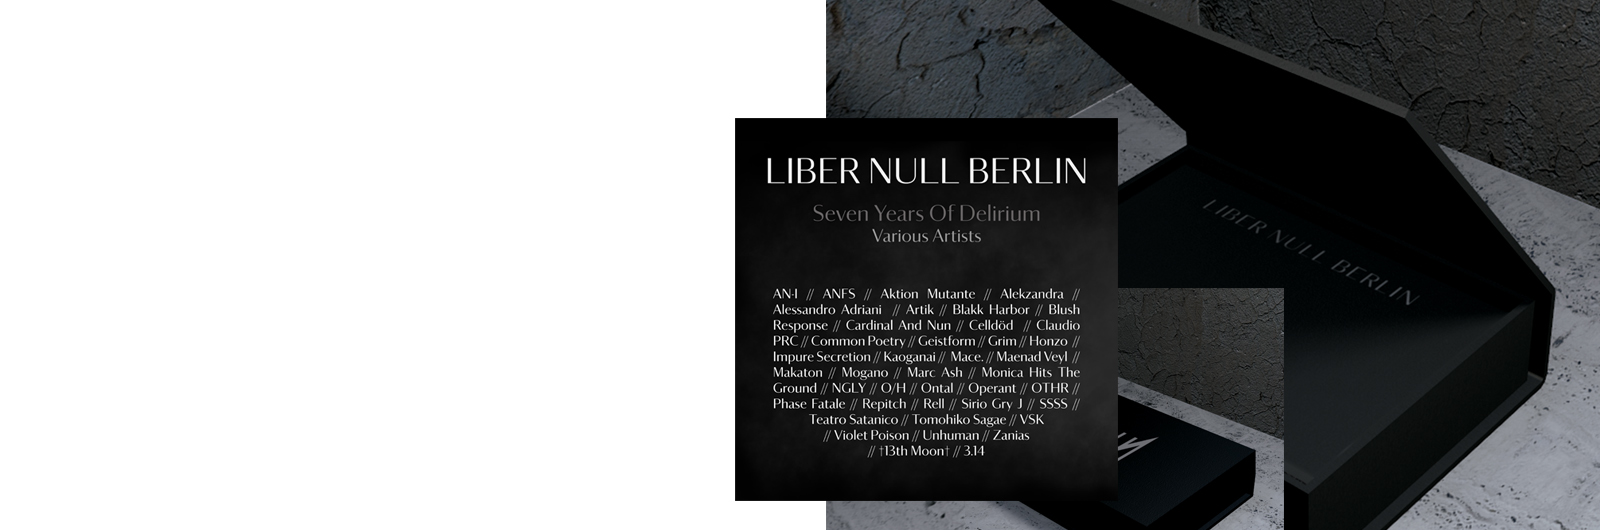 Banner-promo-liber-null